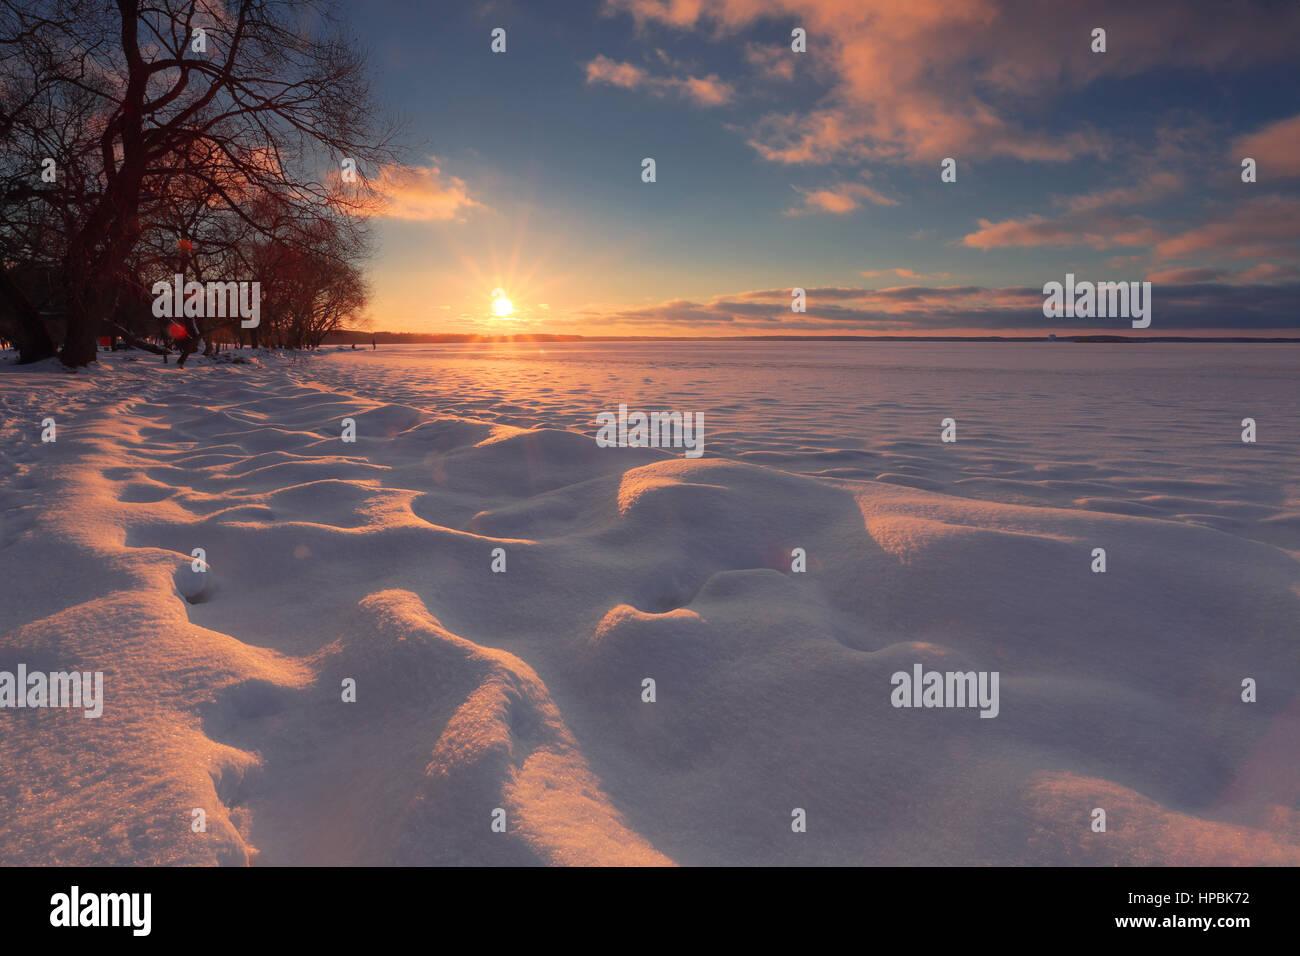 Winter sunrise background. Sun touch horizon. Sunlight illuminate snow. Colorful Christmas sky. - Stock Image